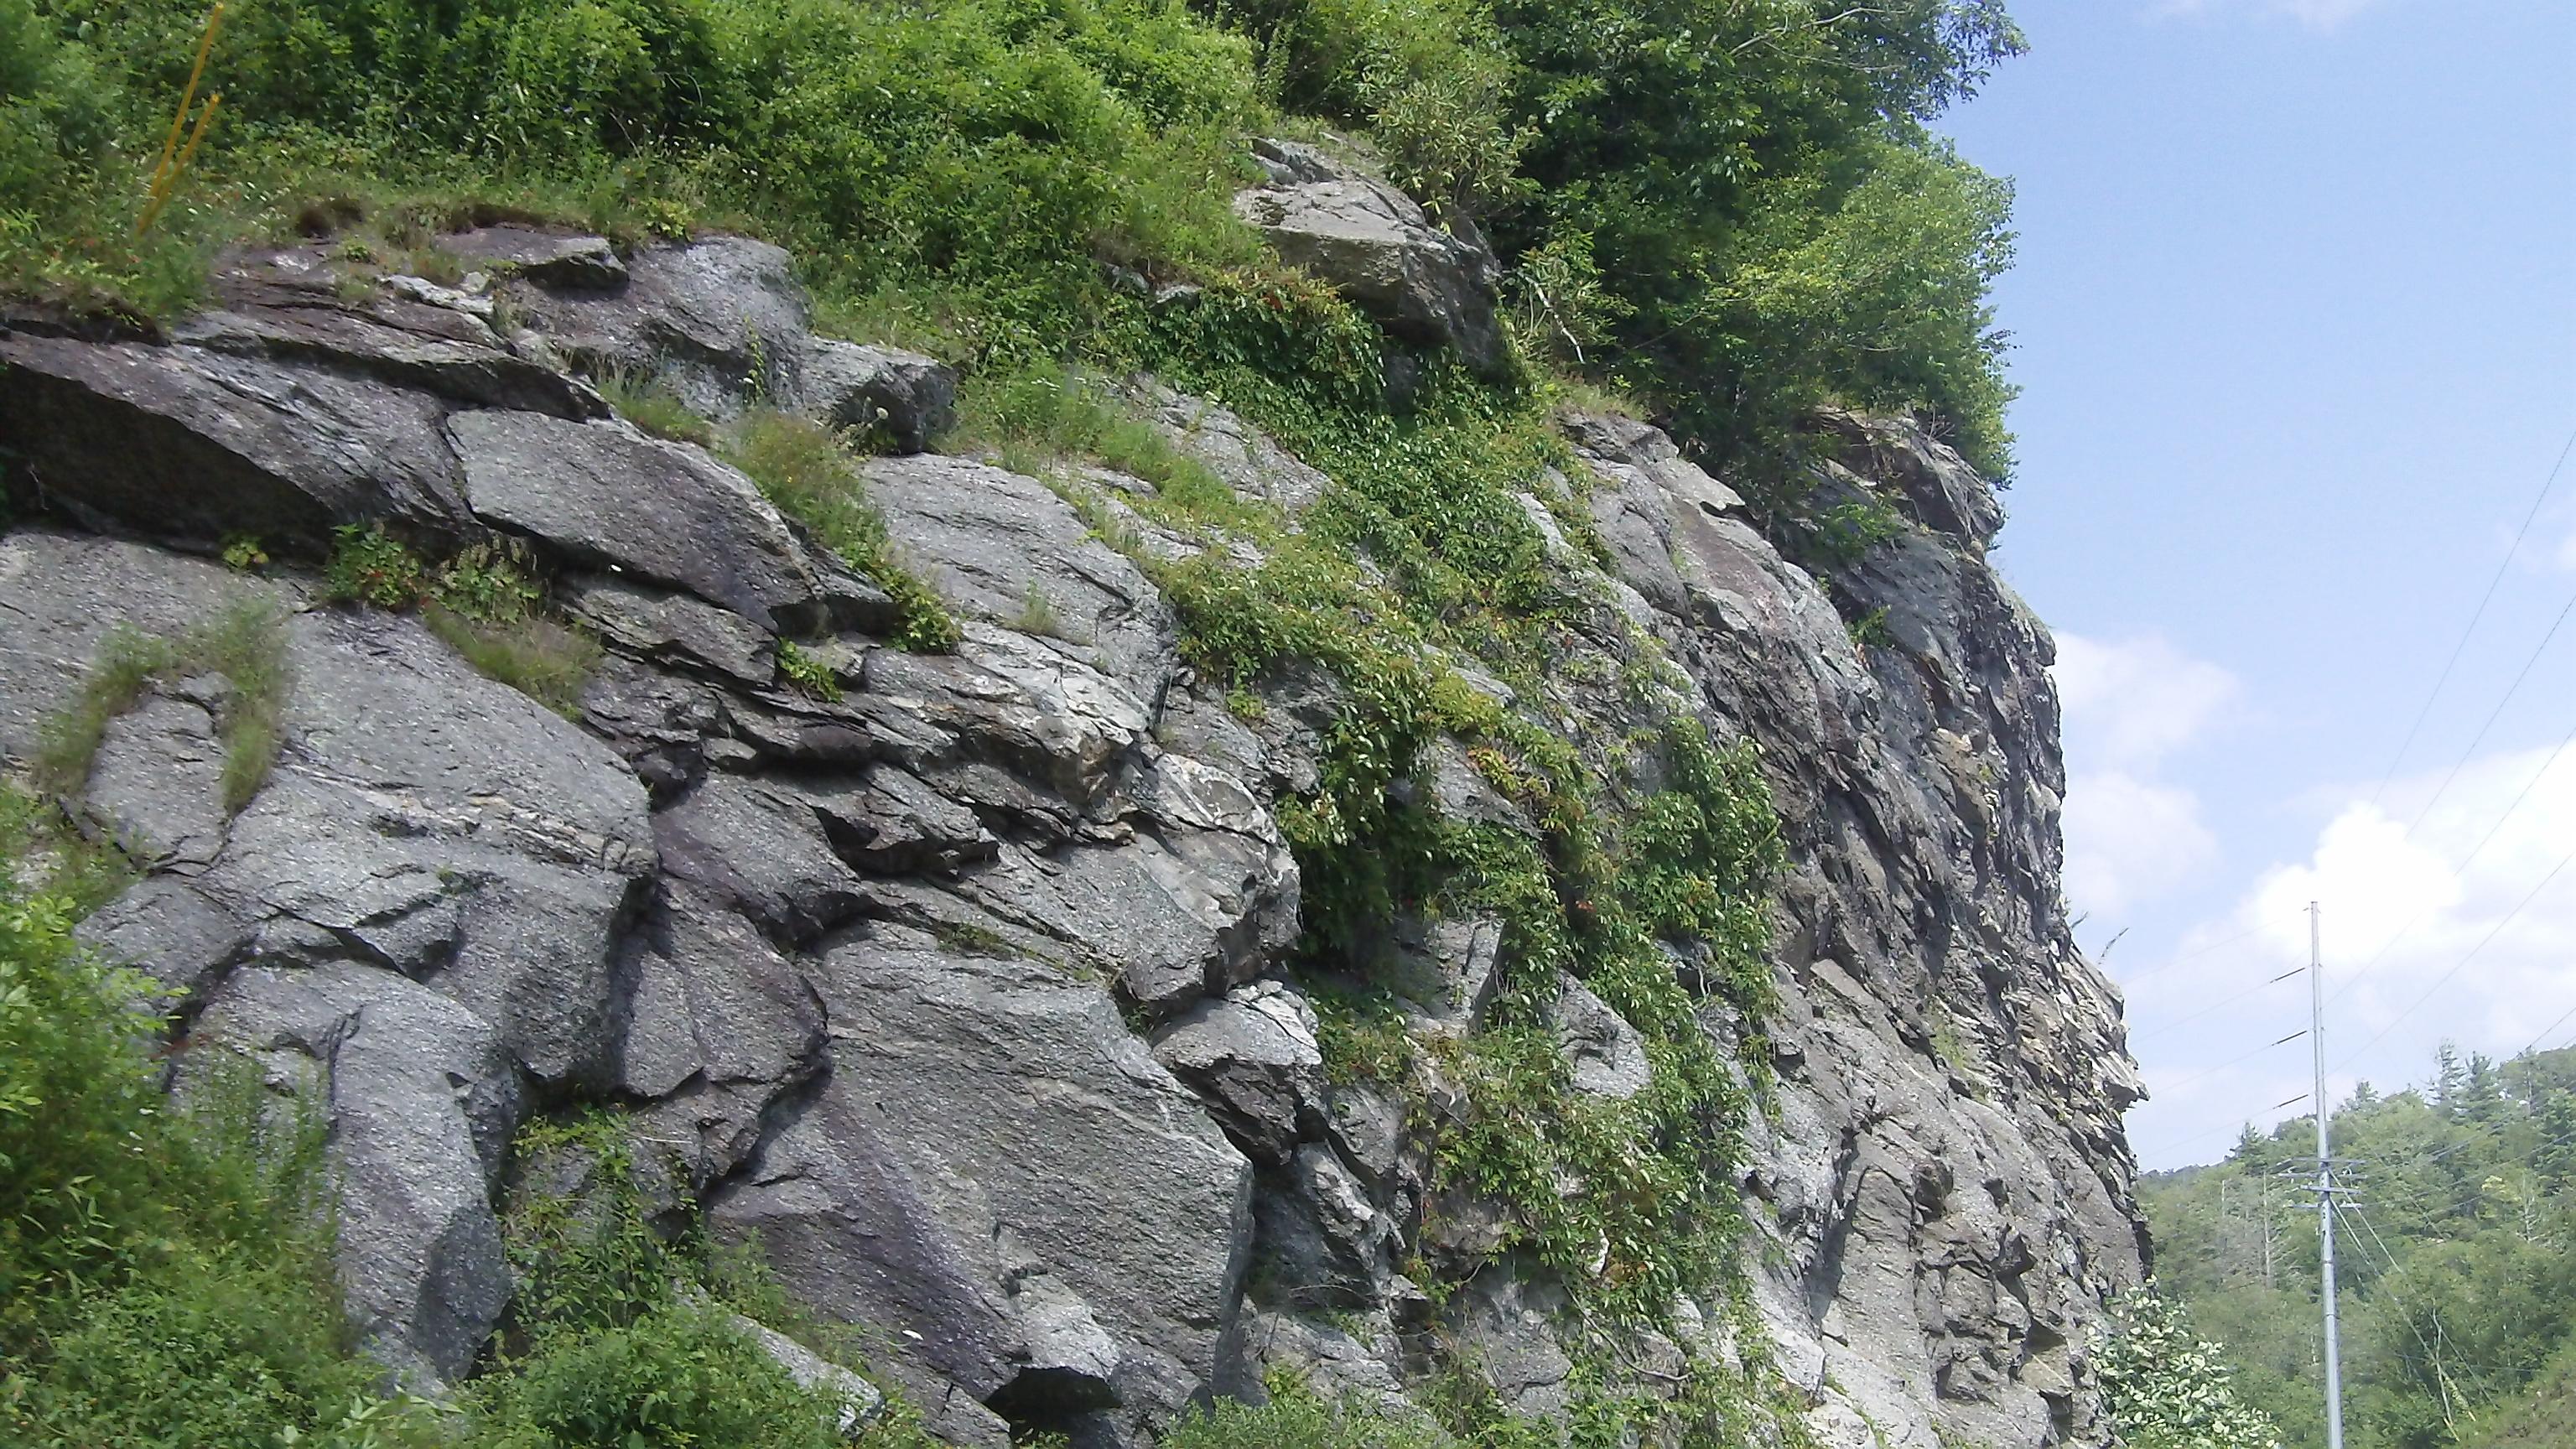 Rock Formation in N.C.